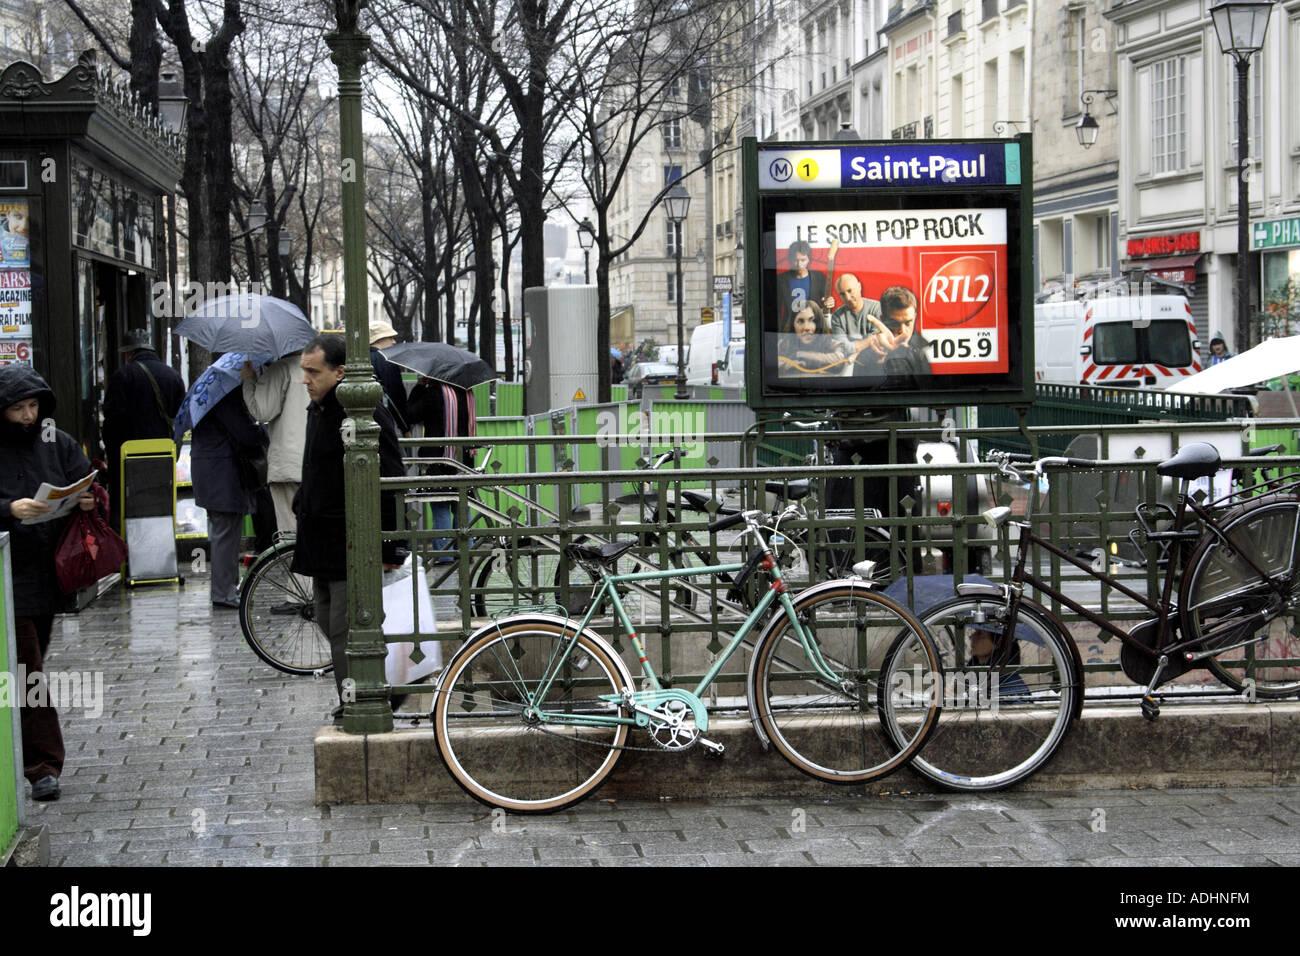 paris and the metro st paul stock photo 13426183 alamy. Black Bedroom Furniture Sets. Home Design Ideas